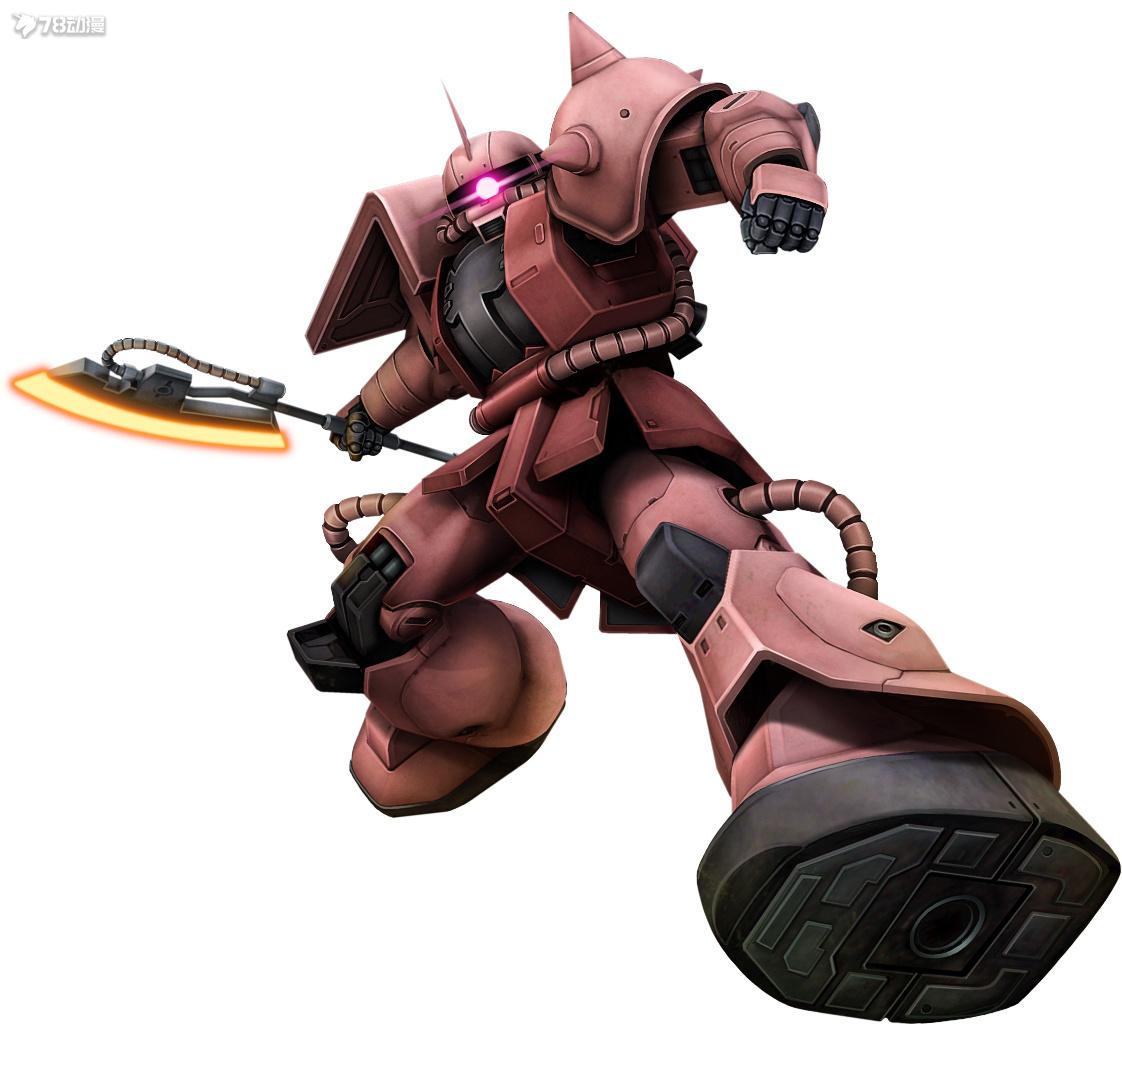 Zaku_II_C_Char_Gundam_Online..png